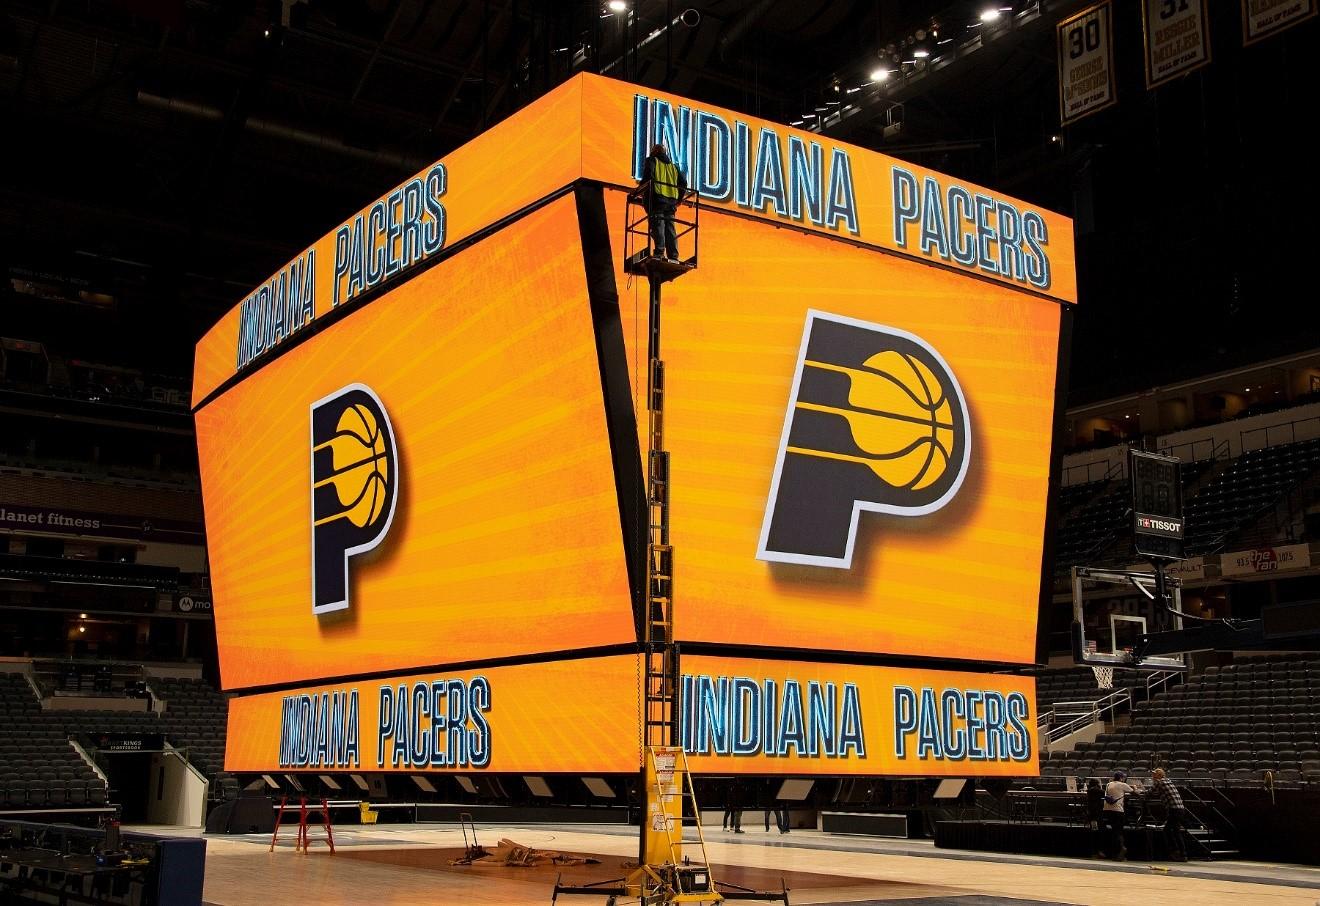 ANC | 3 Ways We've Transformed Sports Arenas with Digital Displays